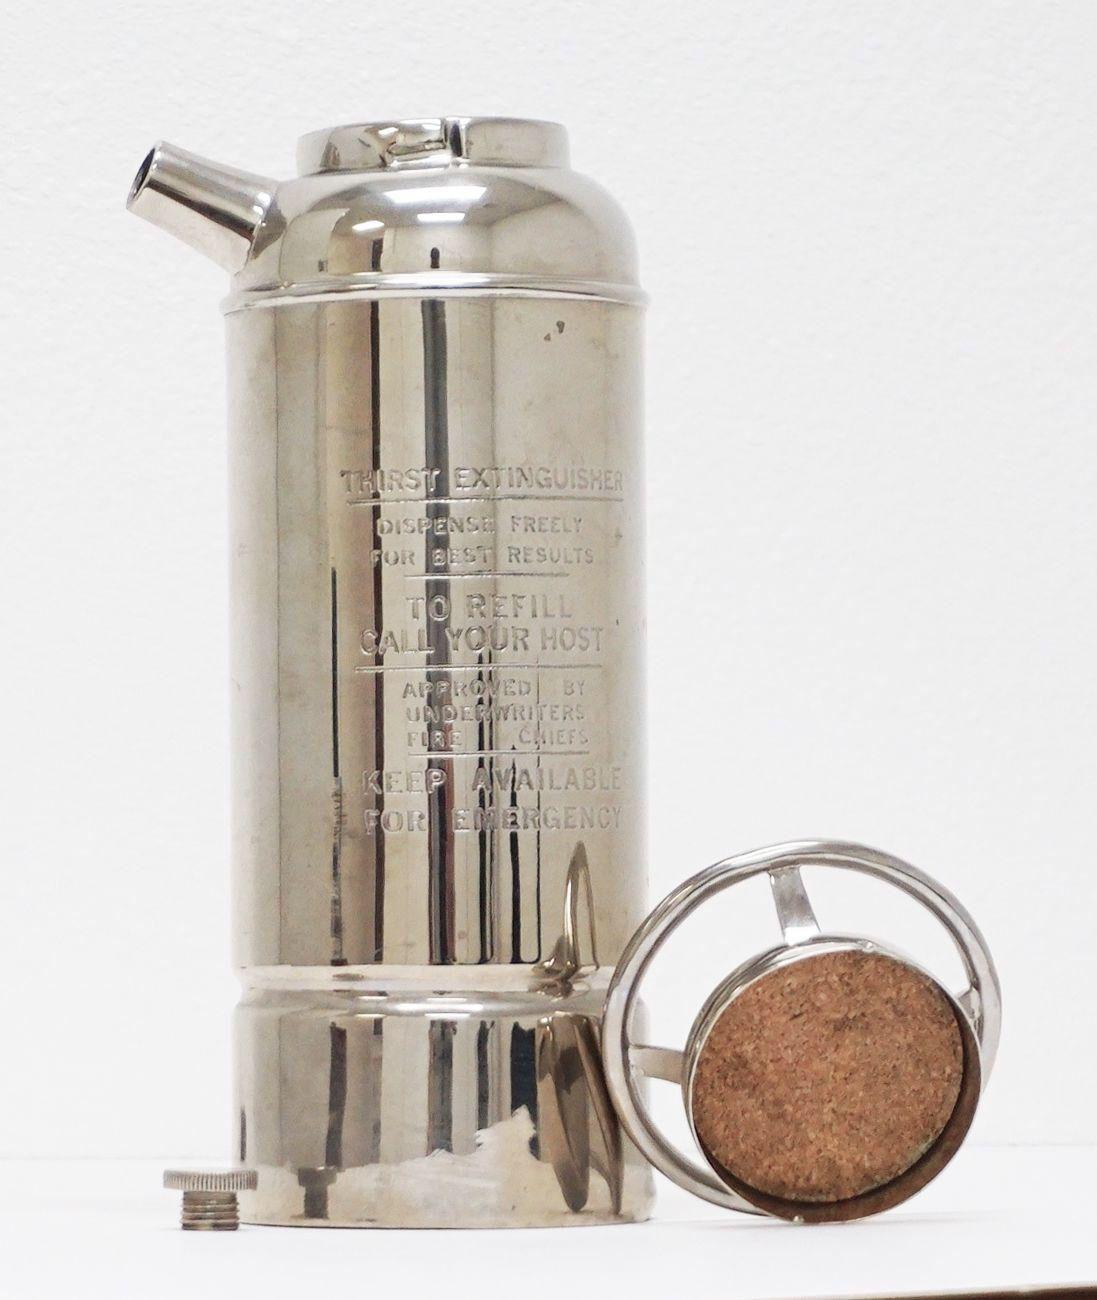 Thirst Extinguisher Cocktail Shaker